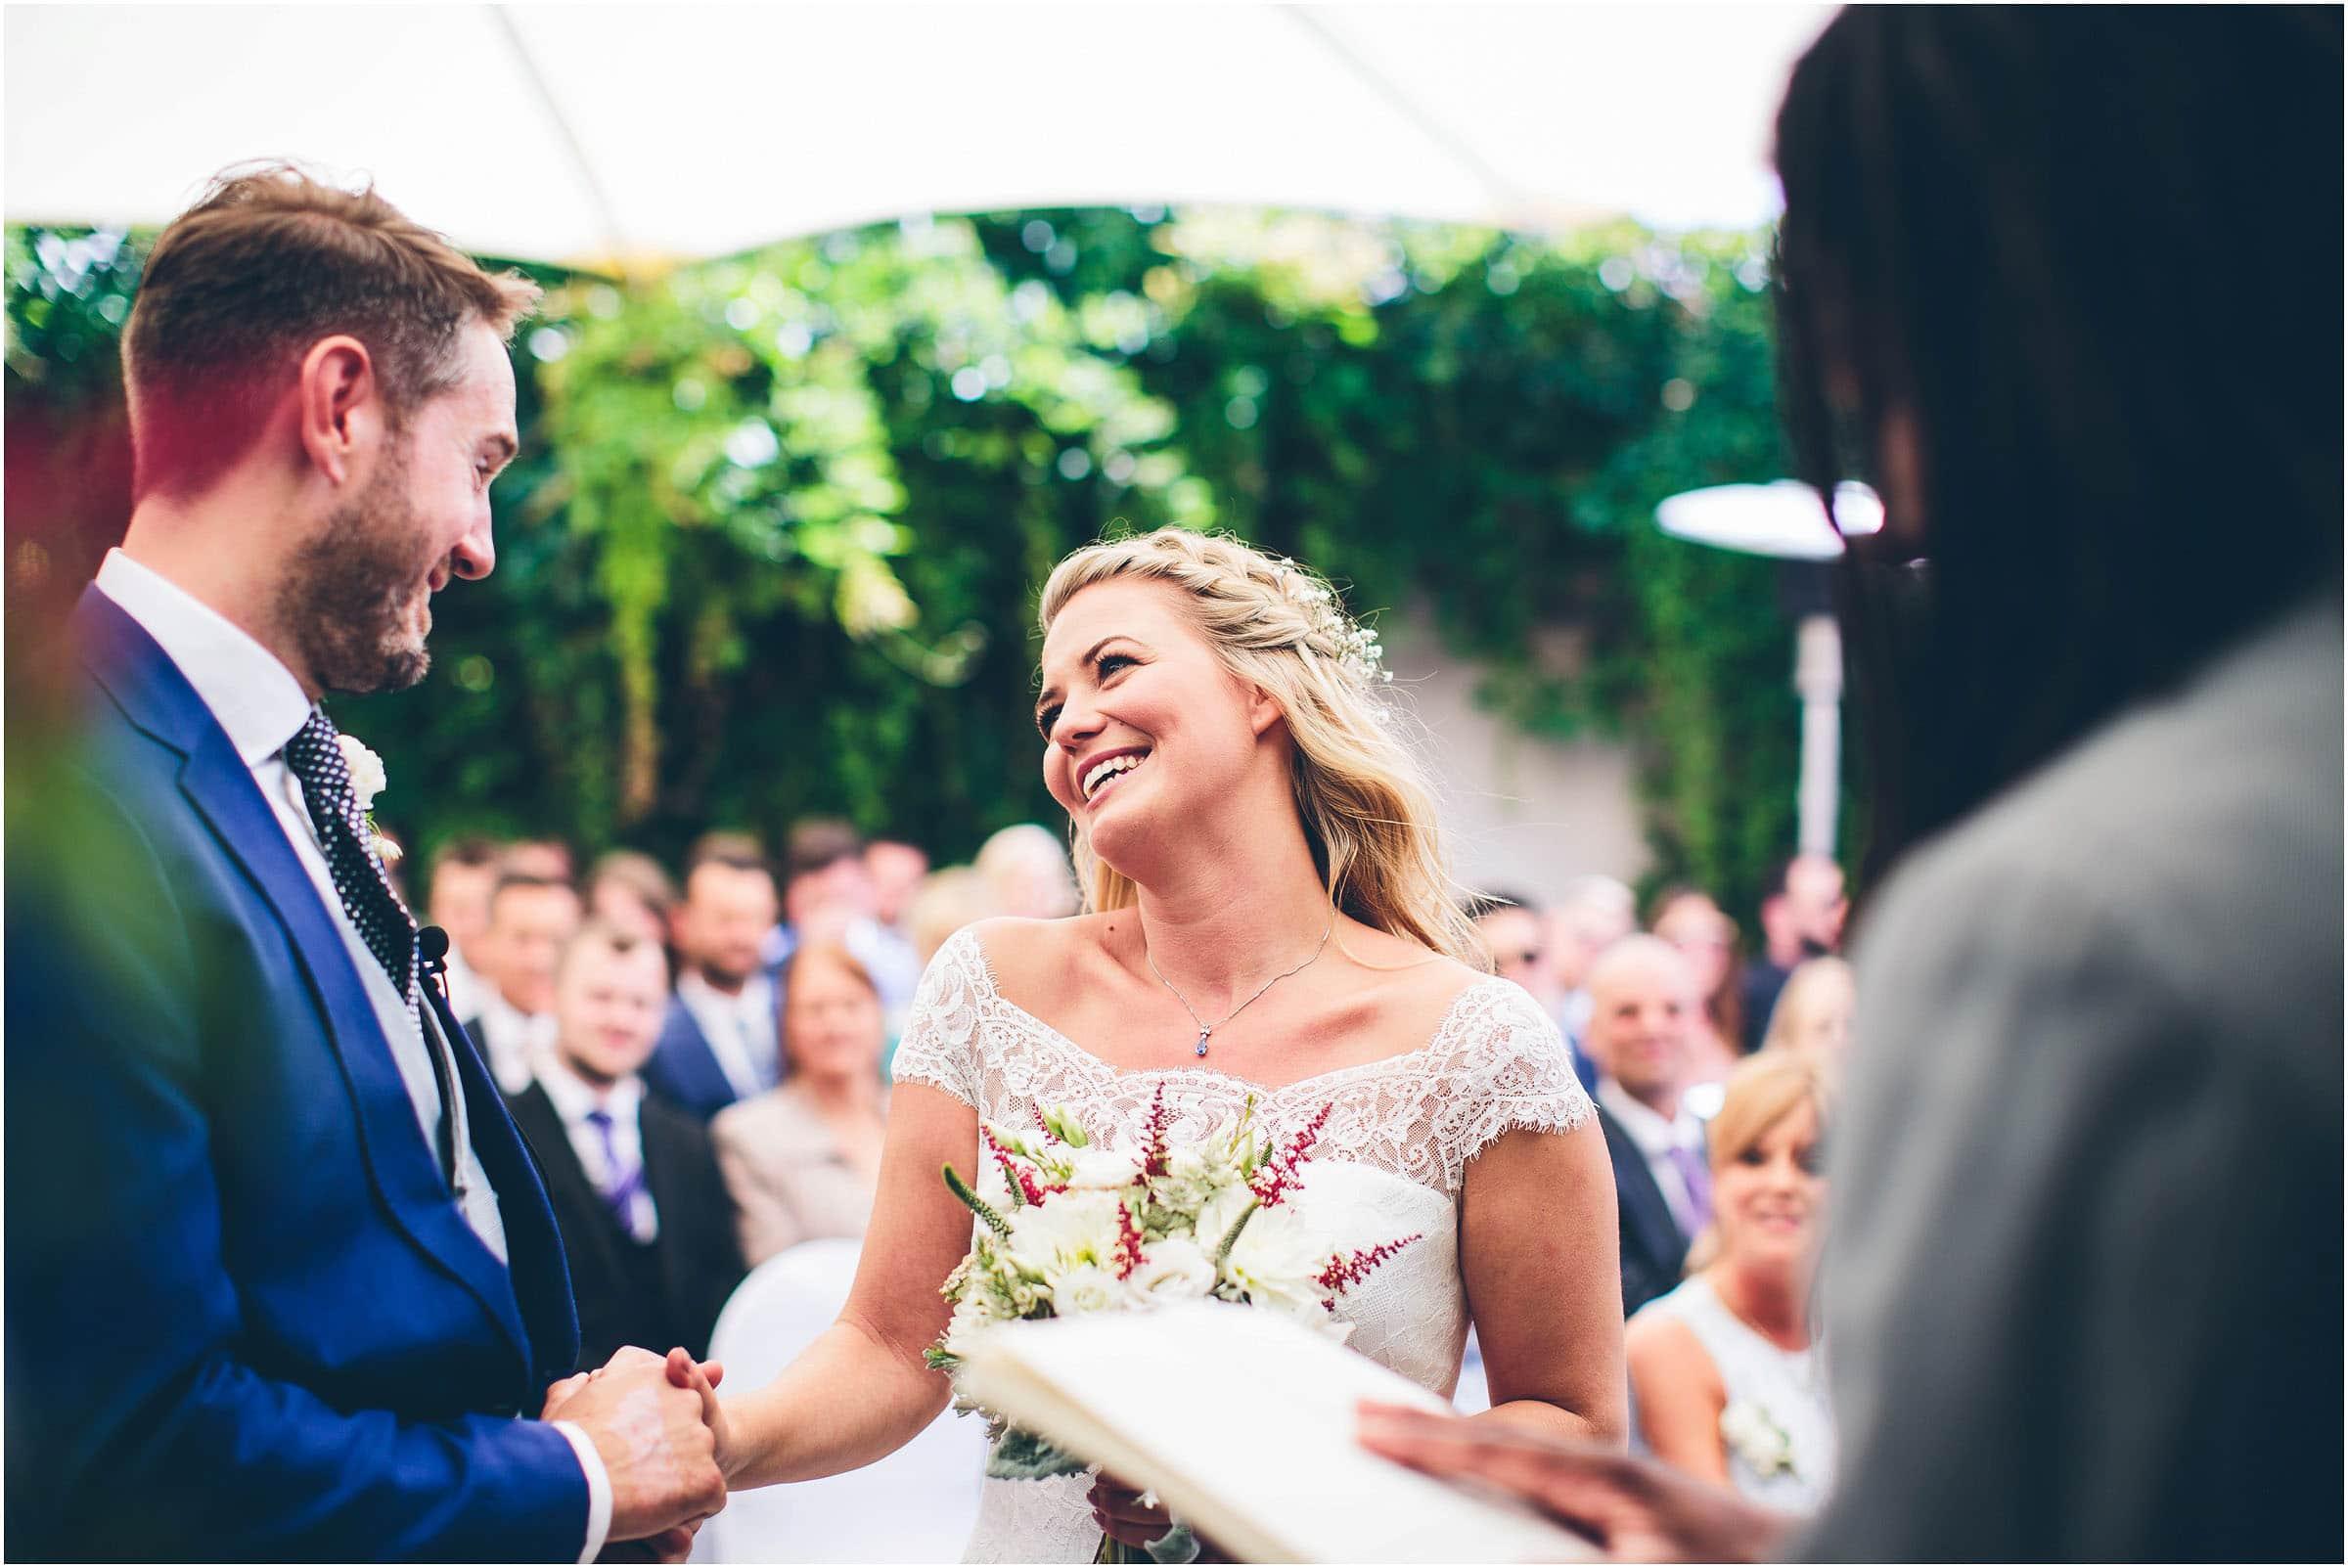 Kensington_Roof_Gardens_Wedding_Photography_0037